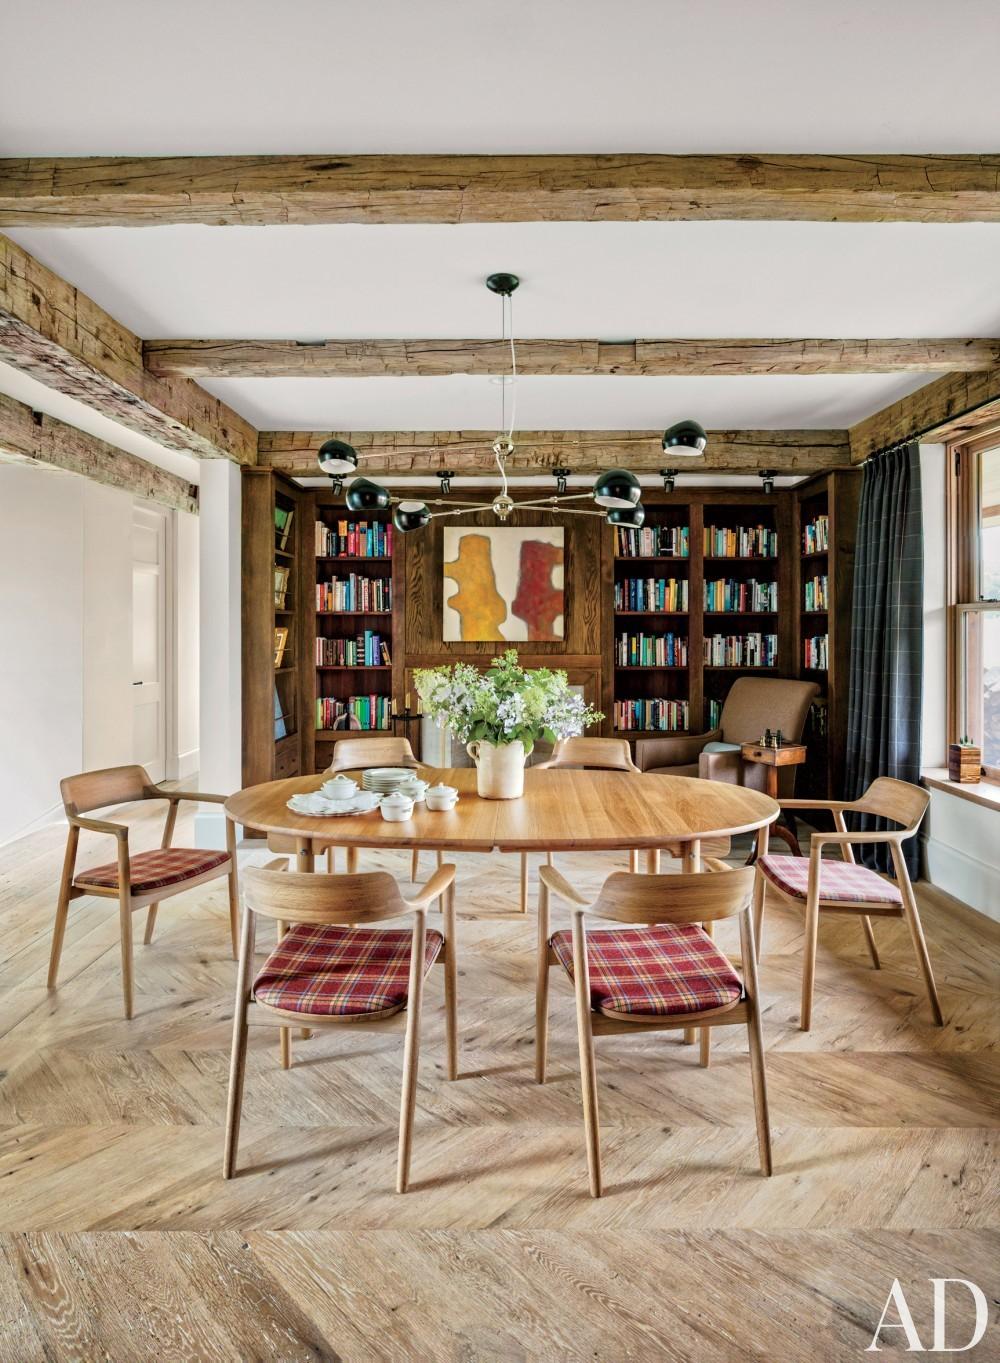 Rustic Dining Room by Kathleen Walsh and Mark Hutker in Martha\'s Vineyard, MA